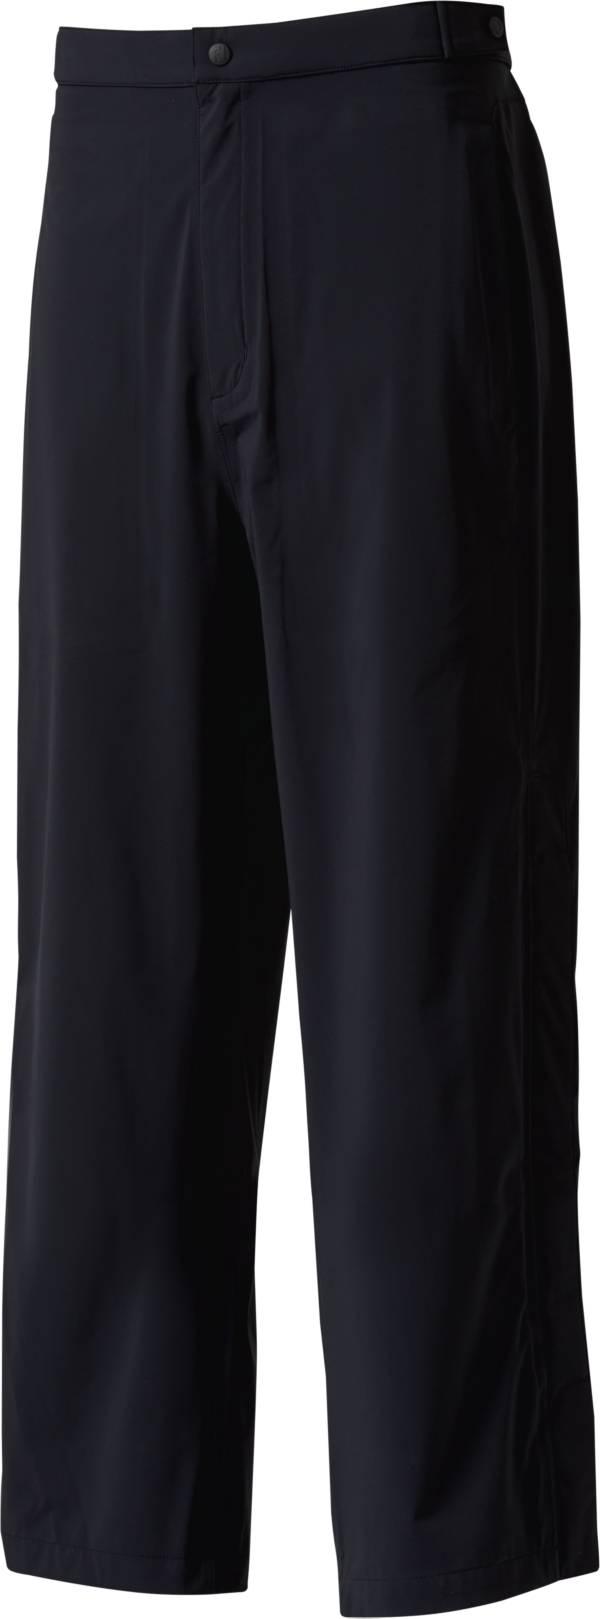 FootJoy Men's DryJoys Tour LTS Golf Rain Pants product image